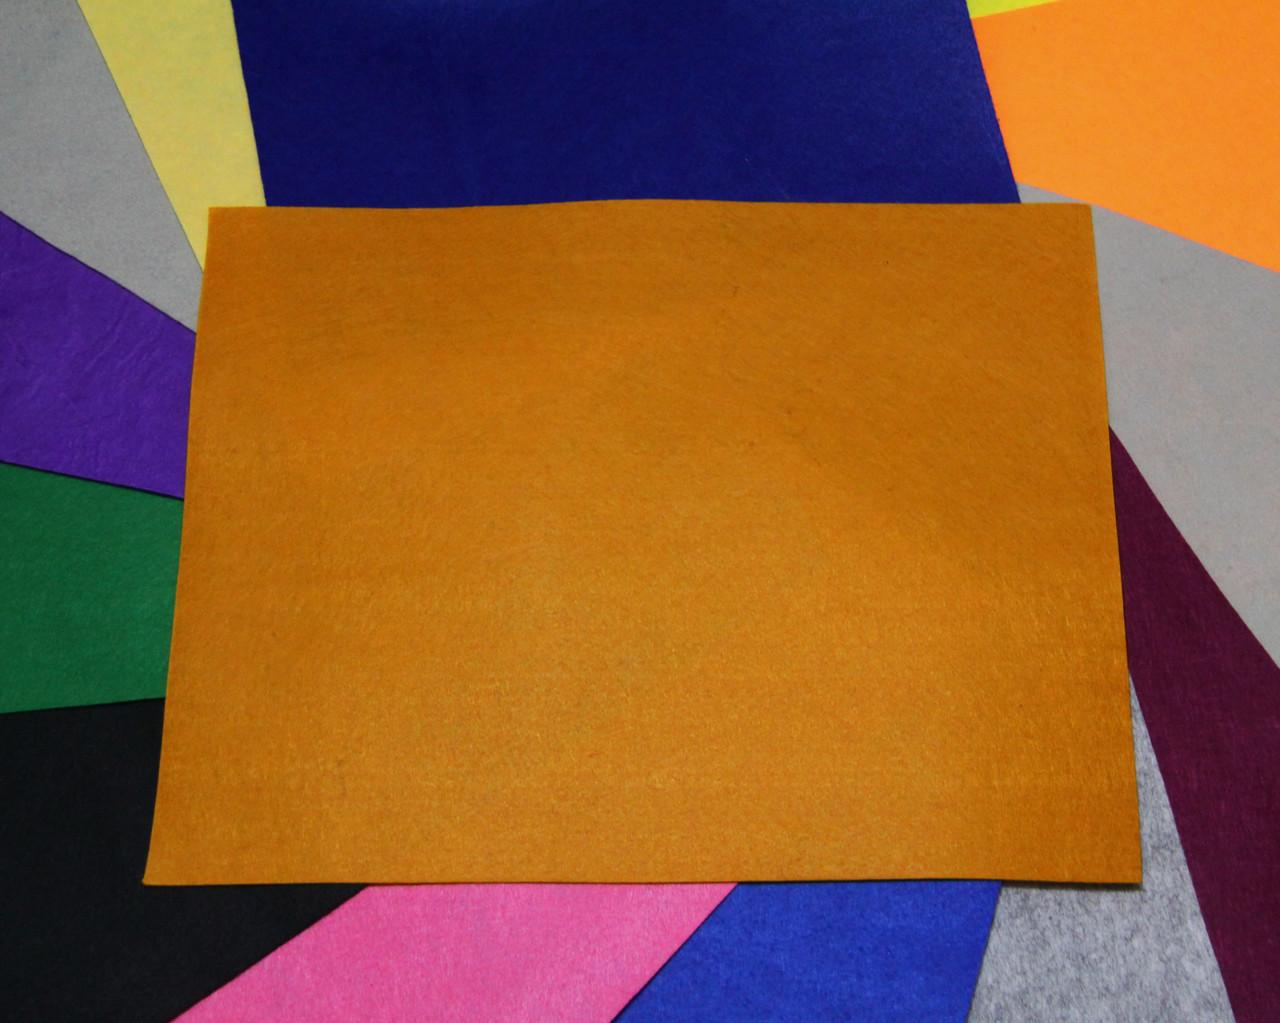 Фетр жесткий рыжий (40х50см, 1мм)